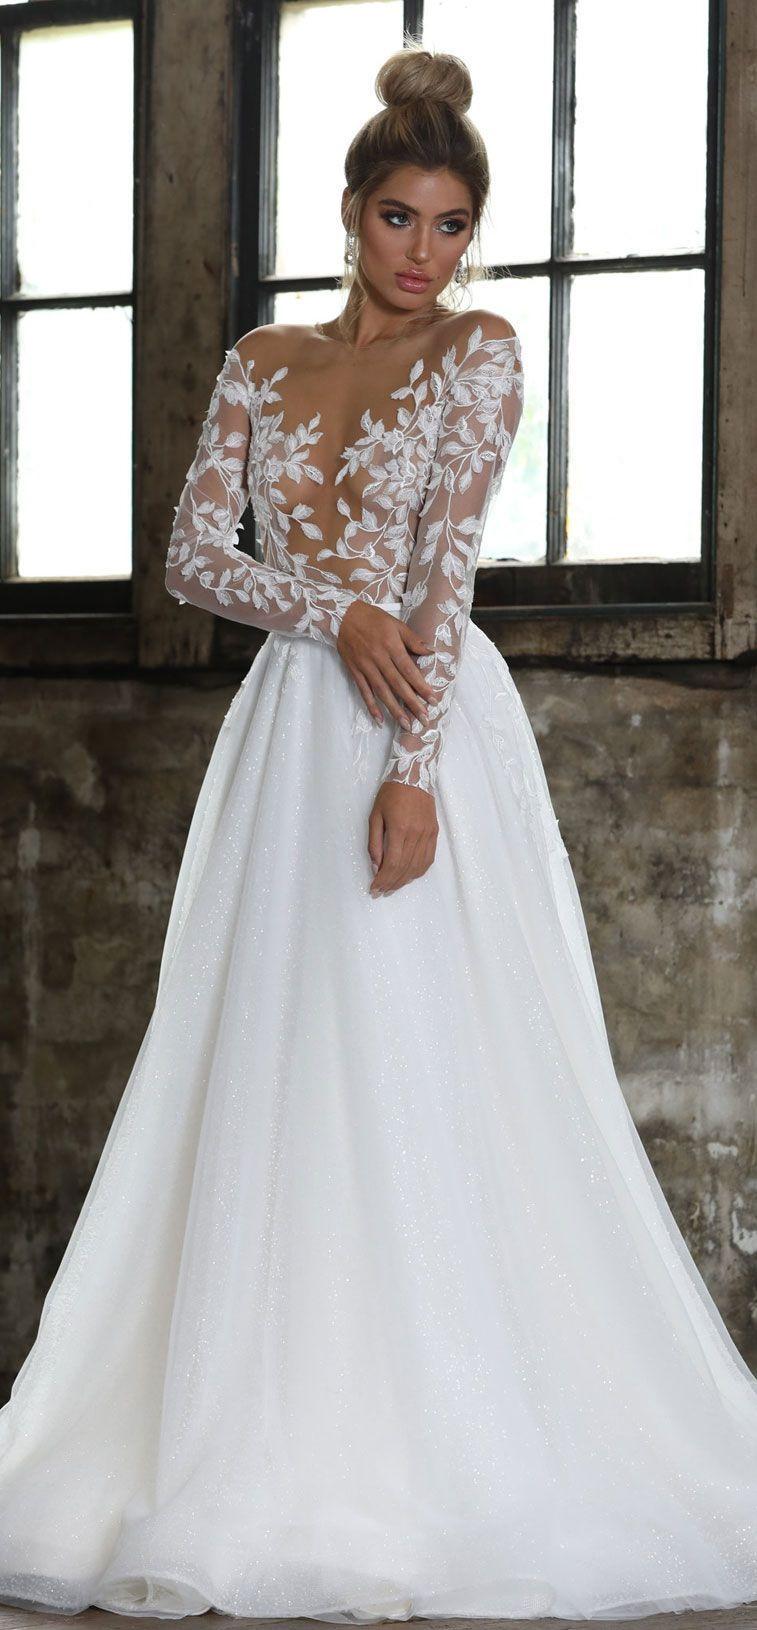 George elsissa wedding dresses ucwhite collection ud bridal